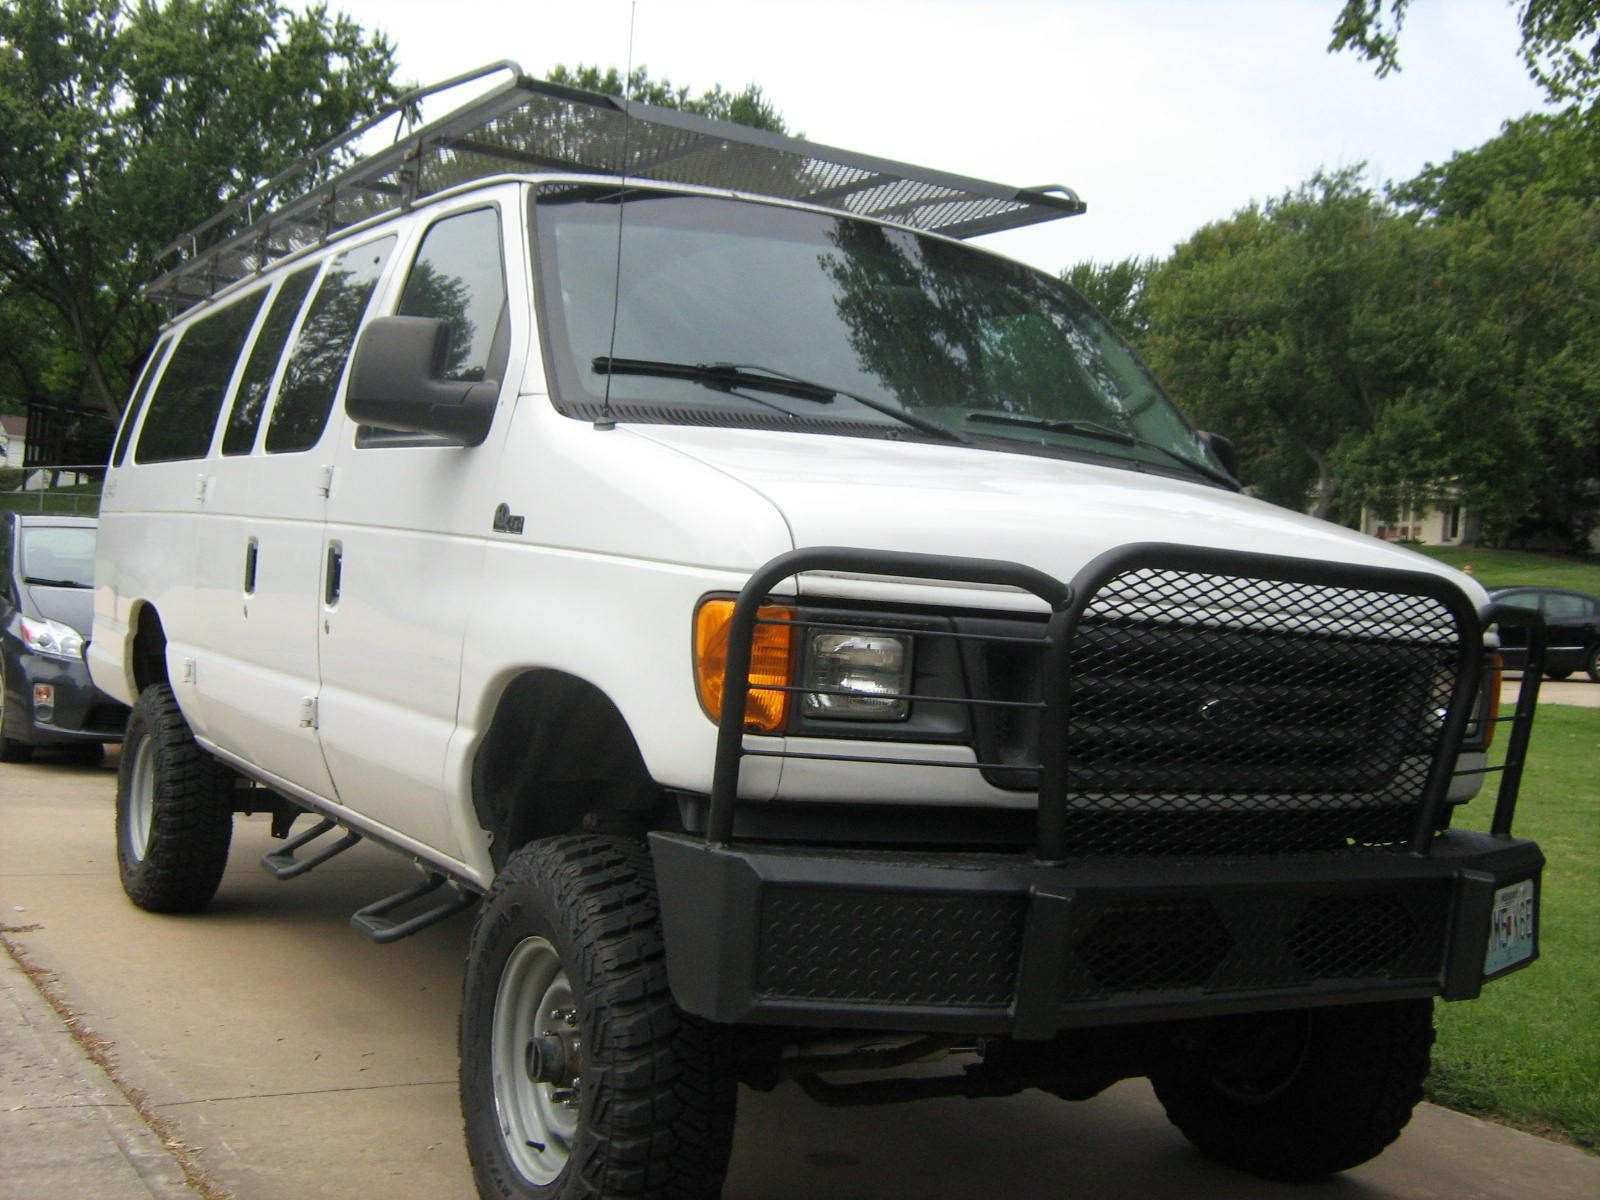 b5ec630e06 2003 Ford E-Series Van 2003 Ford E350 Quigley 4X4 Extended Van 7.3 ...